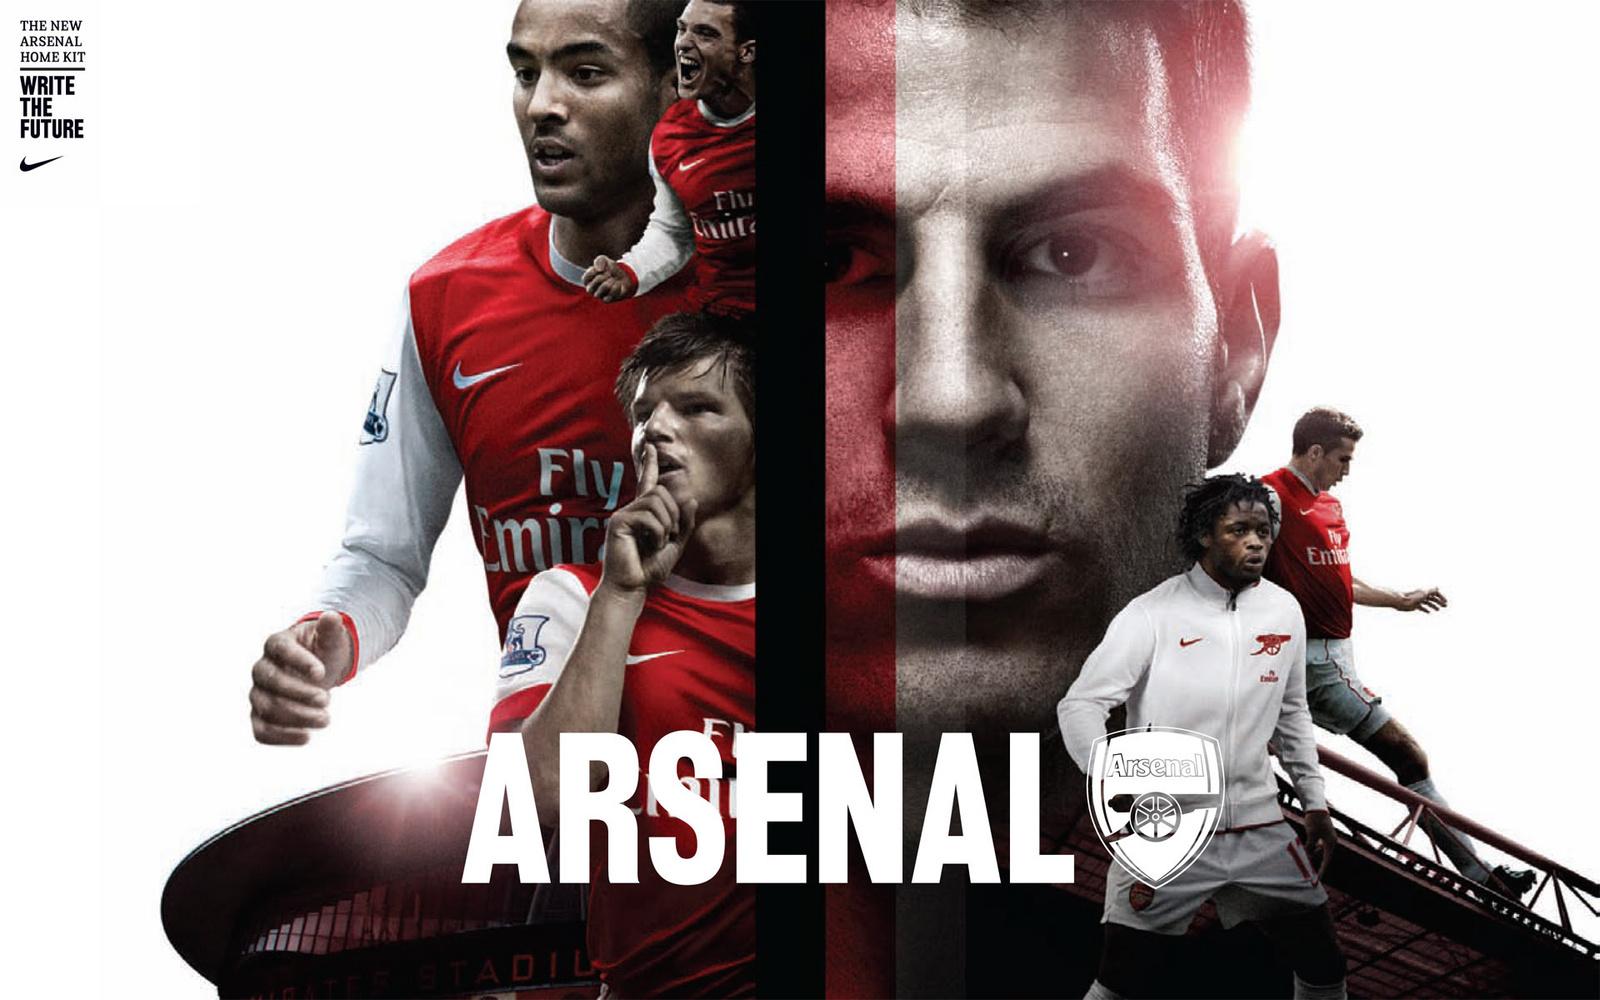 http://2.bp.blogspot.com/-mqiabaoT2H8/Tjol-PNGiMI/AAAAAAAAAfU/RF7Acne0NEo/s1600/Arsenal+Wallpaper+5.jpg